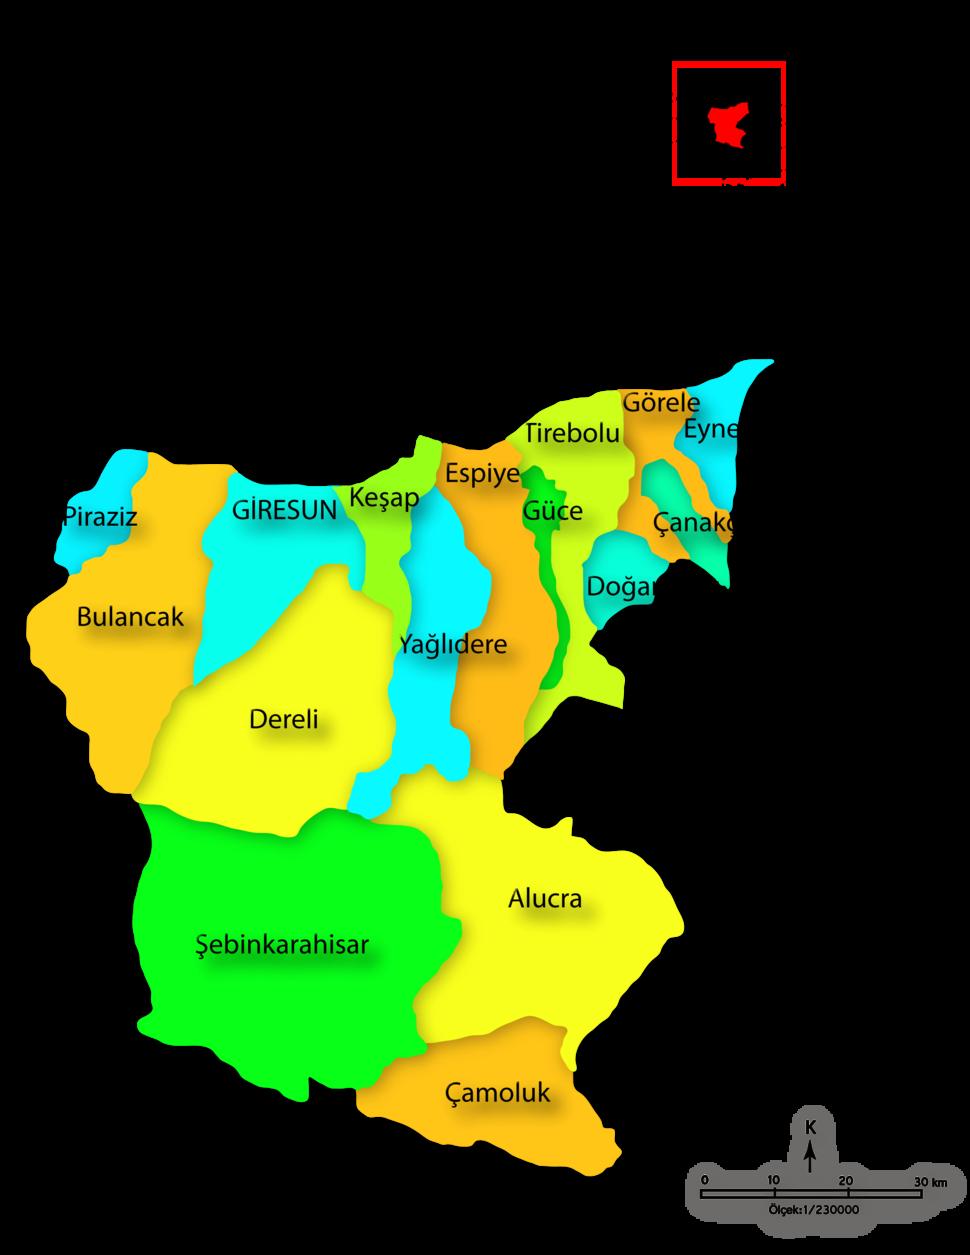 Giresun districts